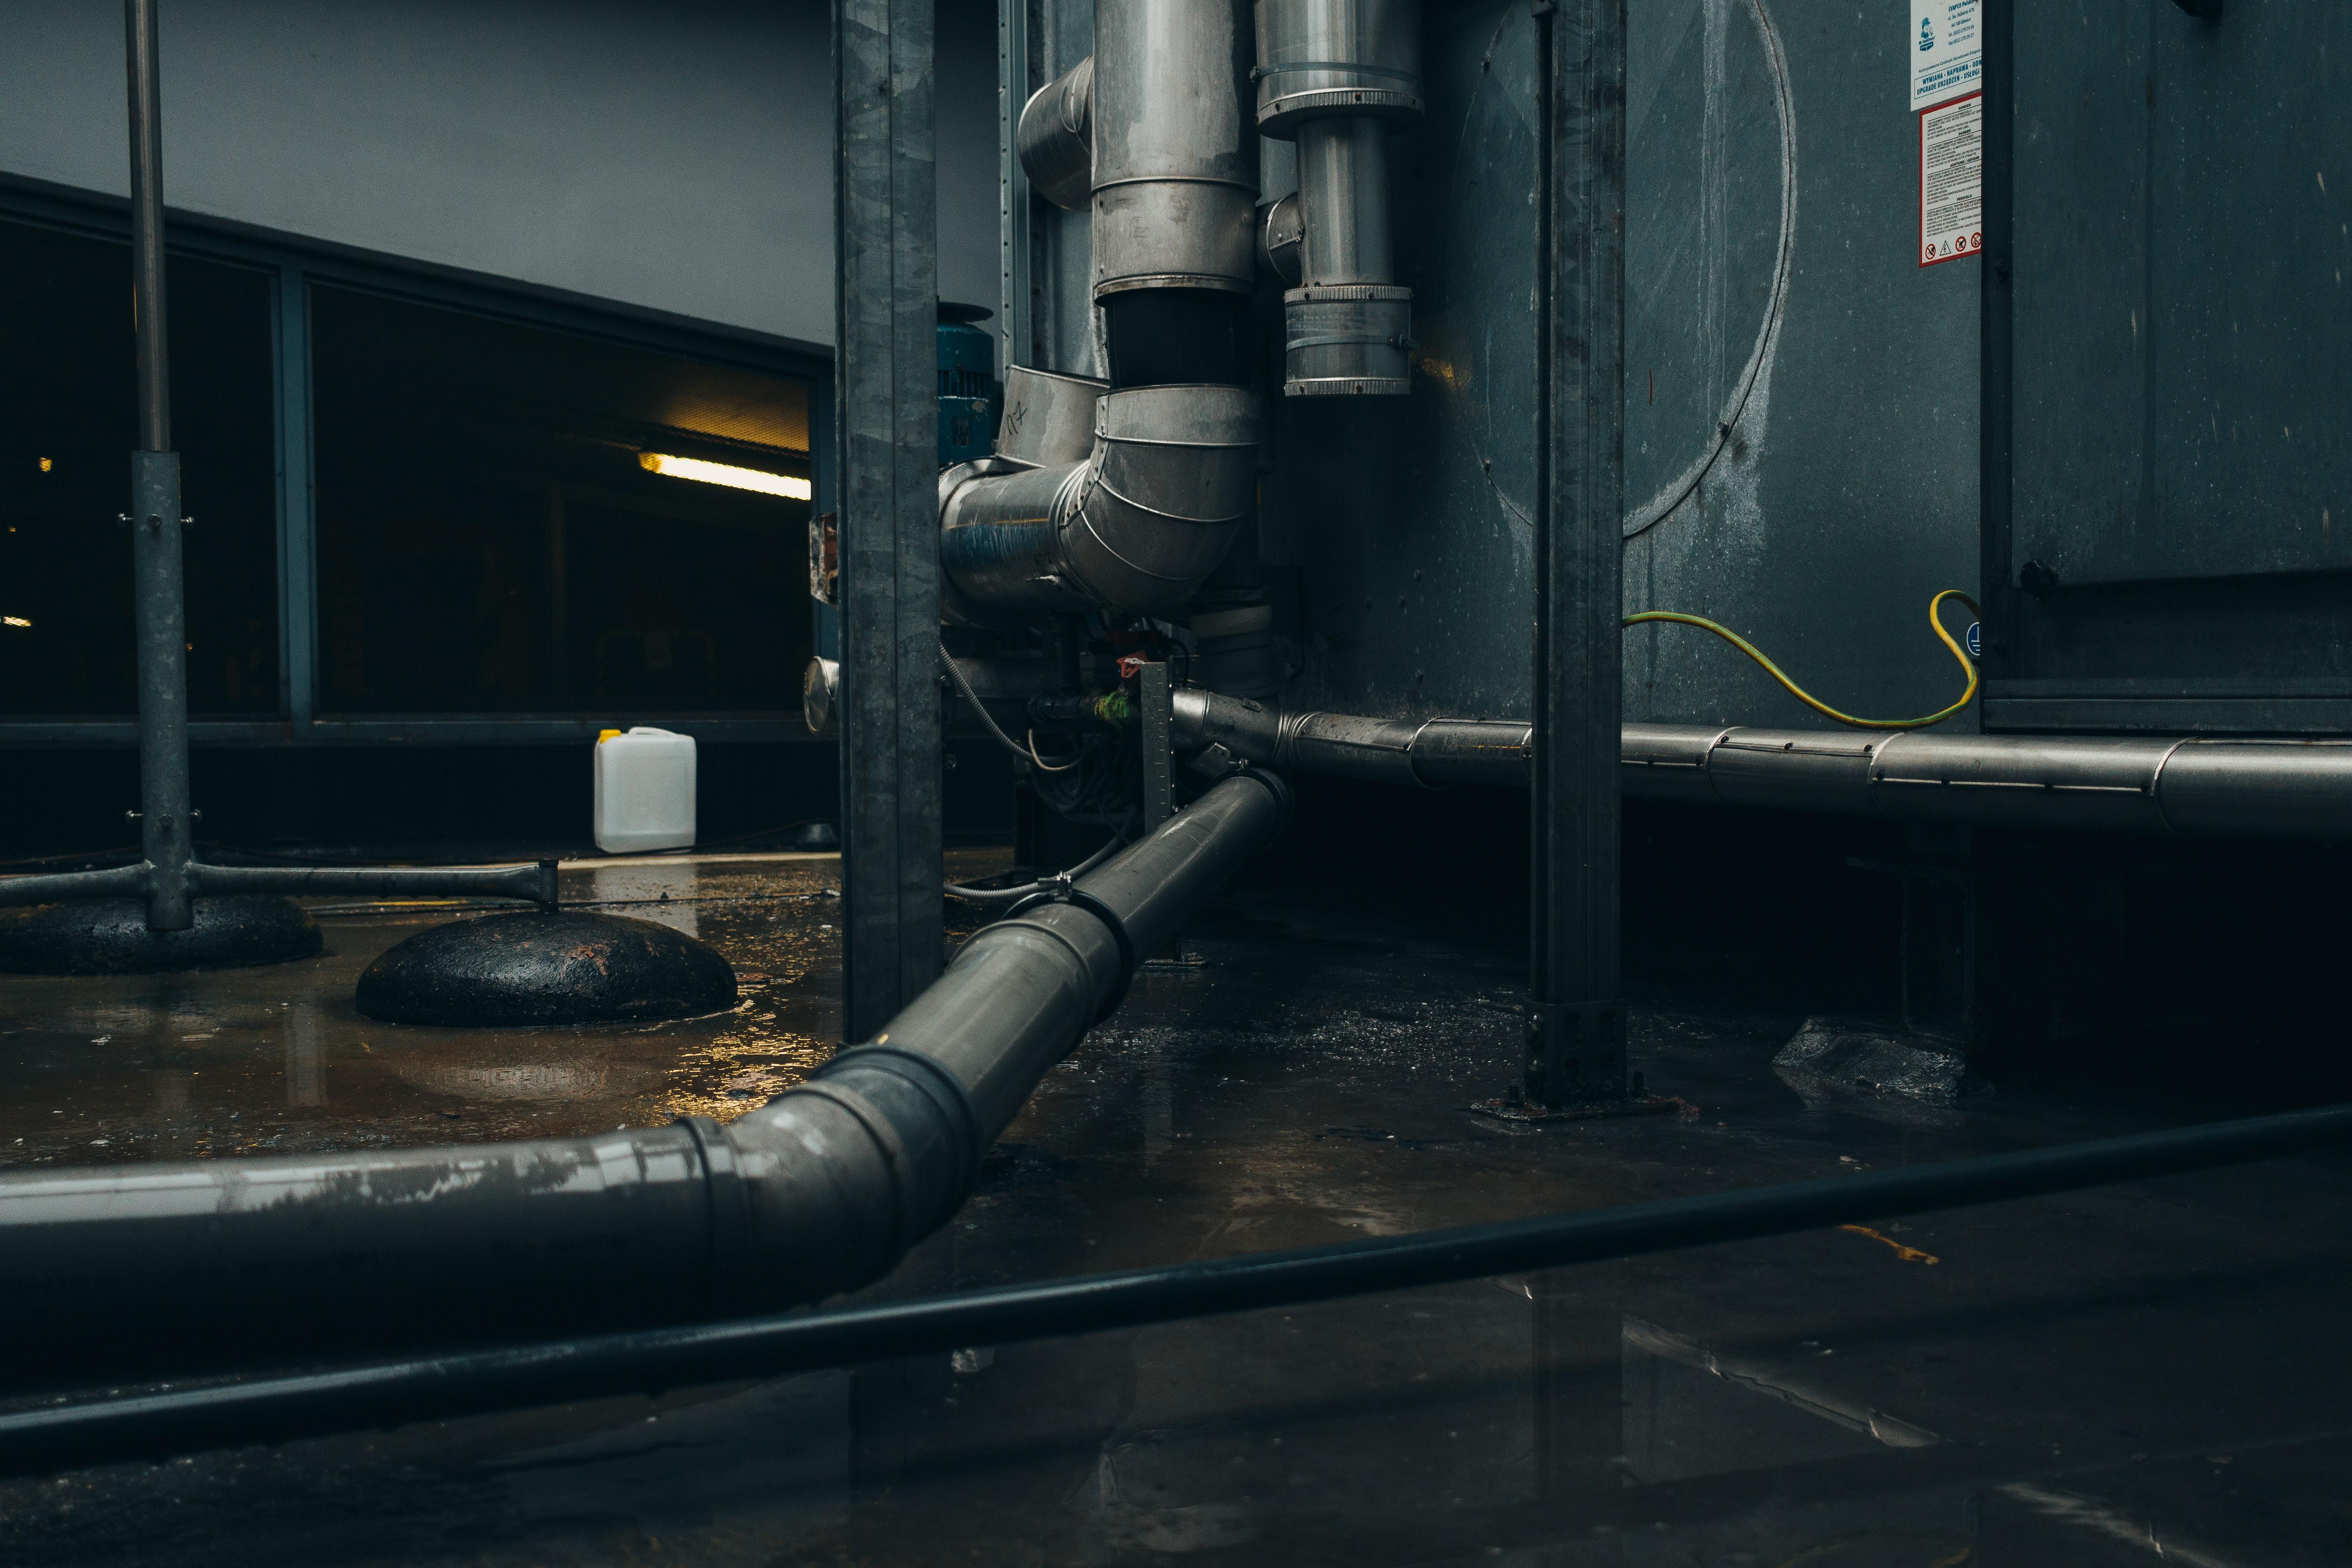 gray steel pipe